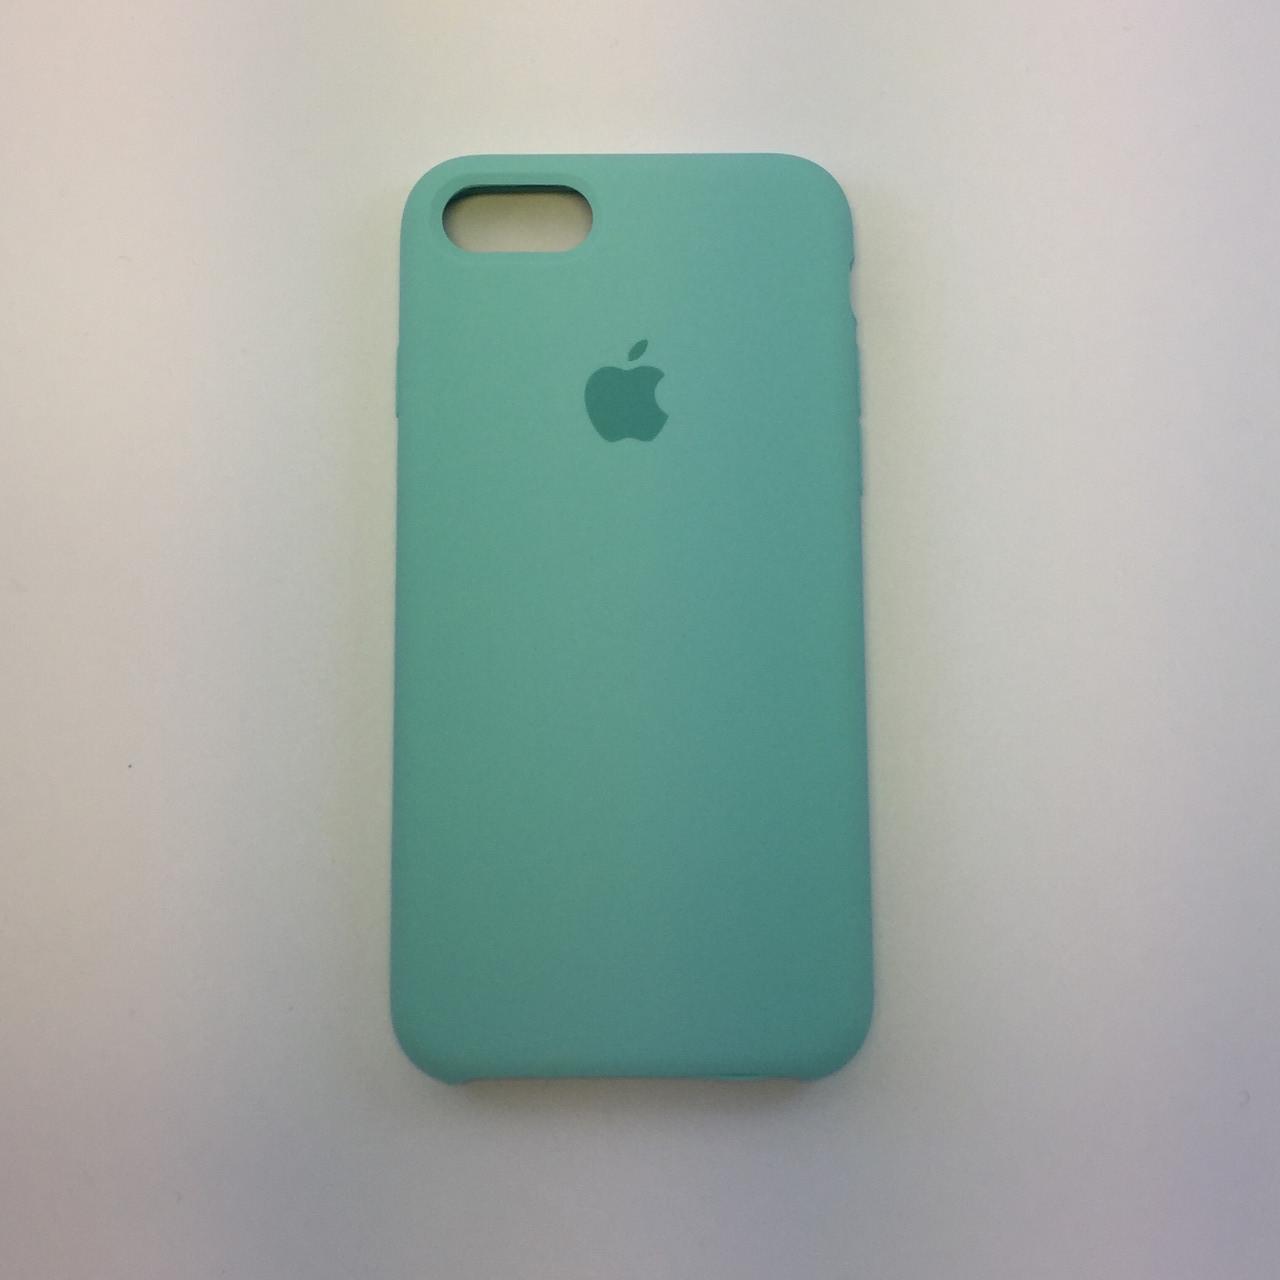 "Чехол - Silicon Case для iPhone ""Зеленая лагуна - №21"" - copy orig."